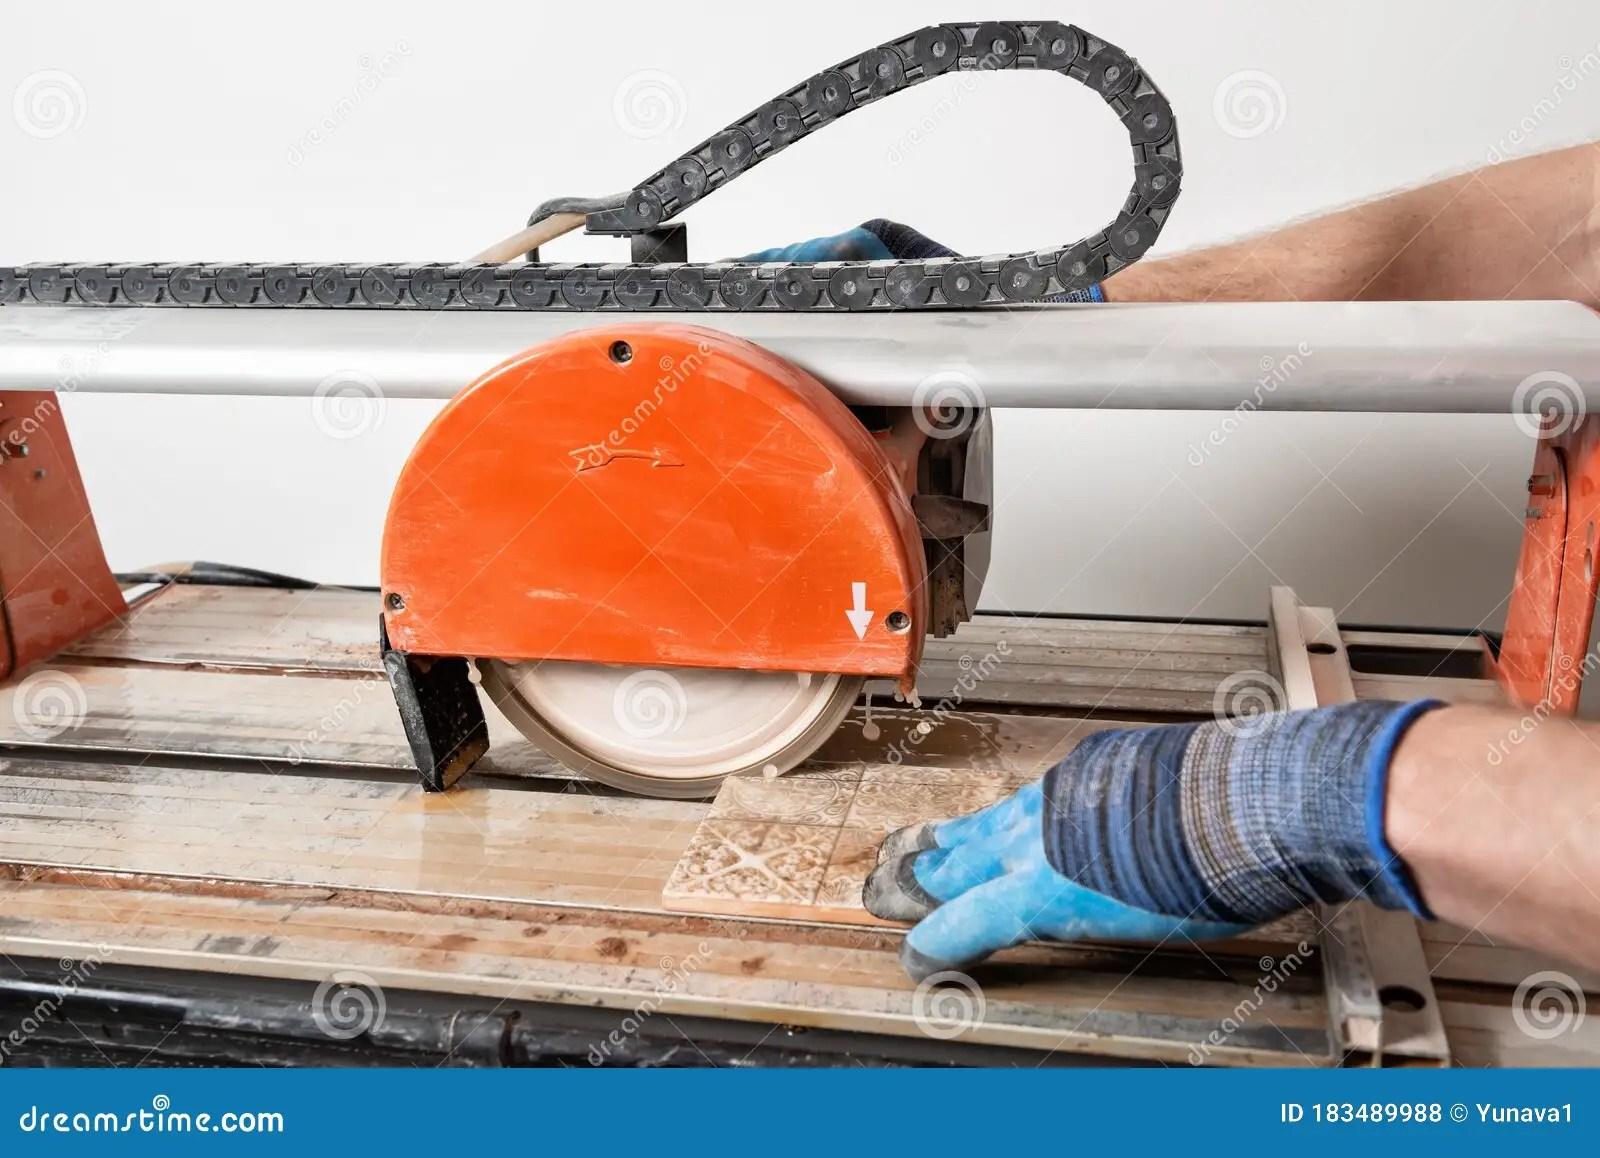 wet cutting a ceramic tile stock photo image of craftsman 183489988